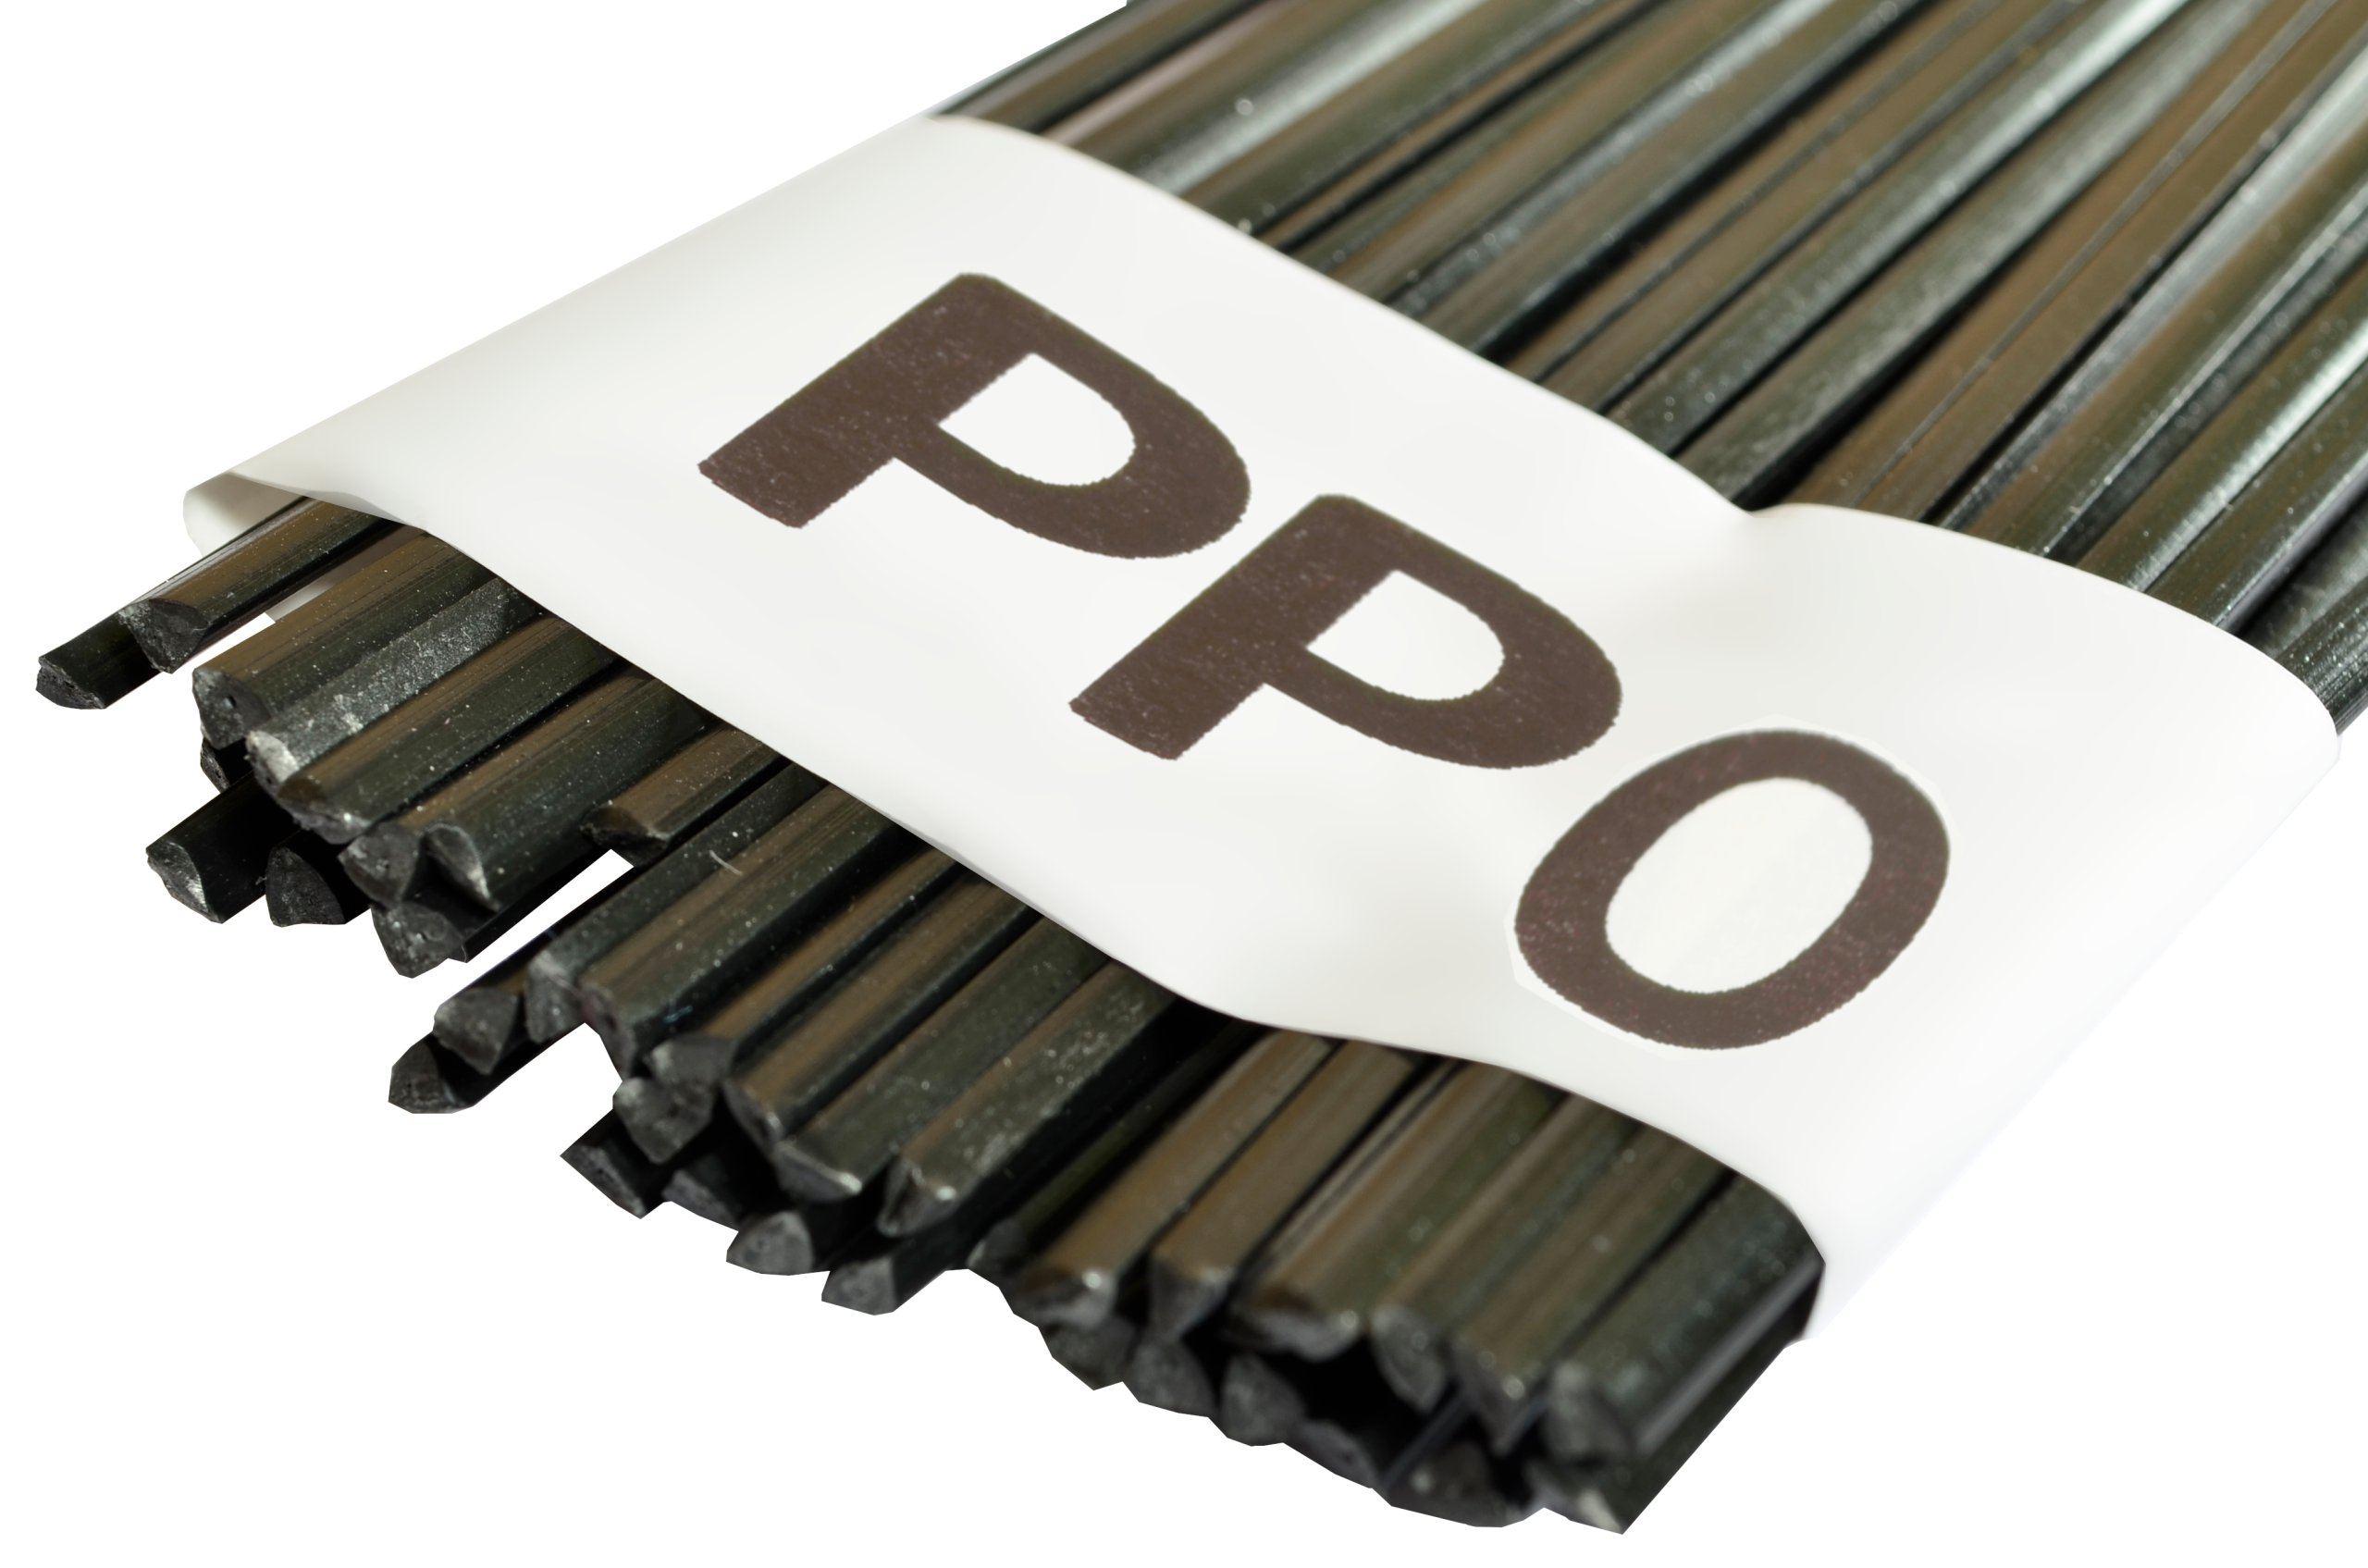 материал пластик связка ппо треугольник 3mm 100g